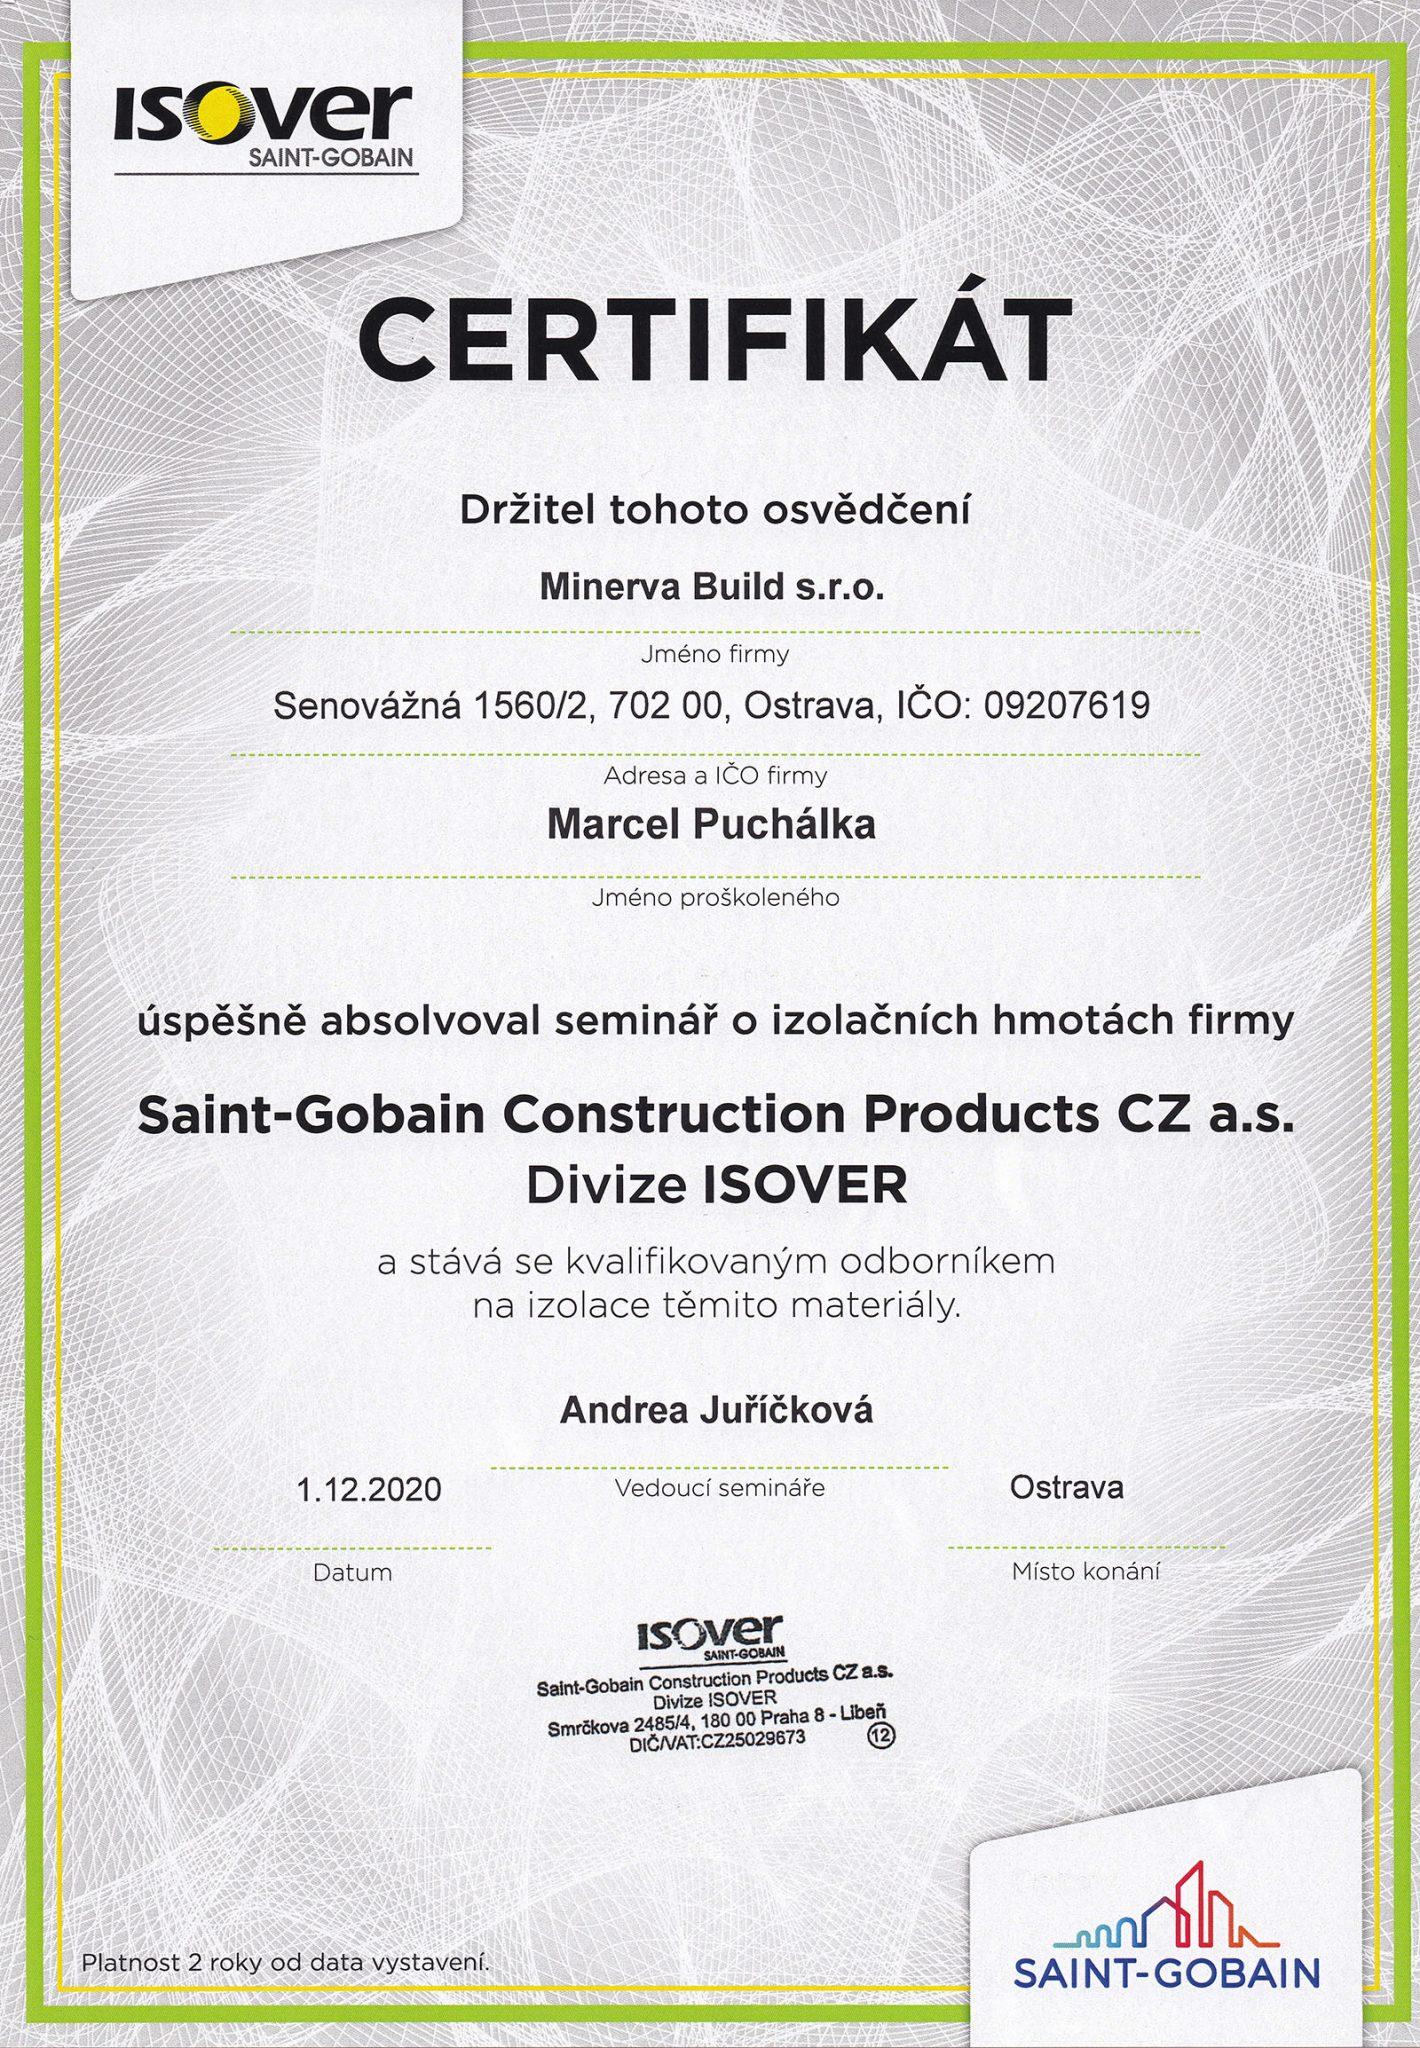 Certifikát firmy ISOVER